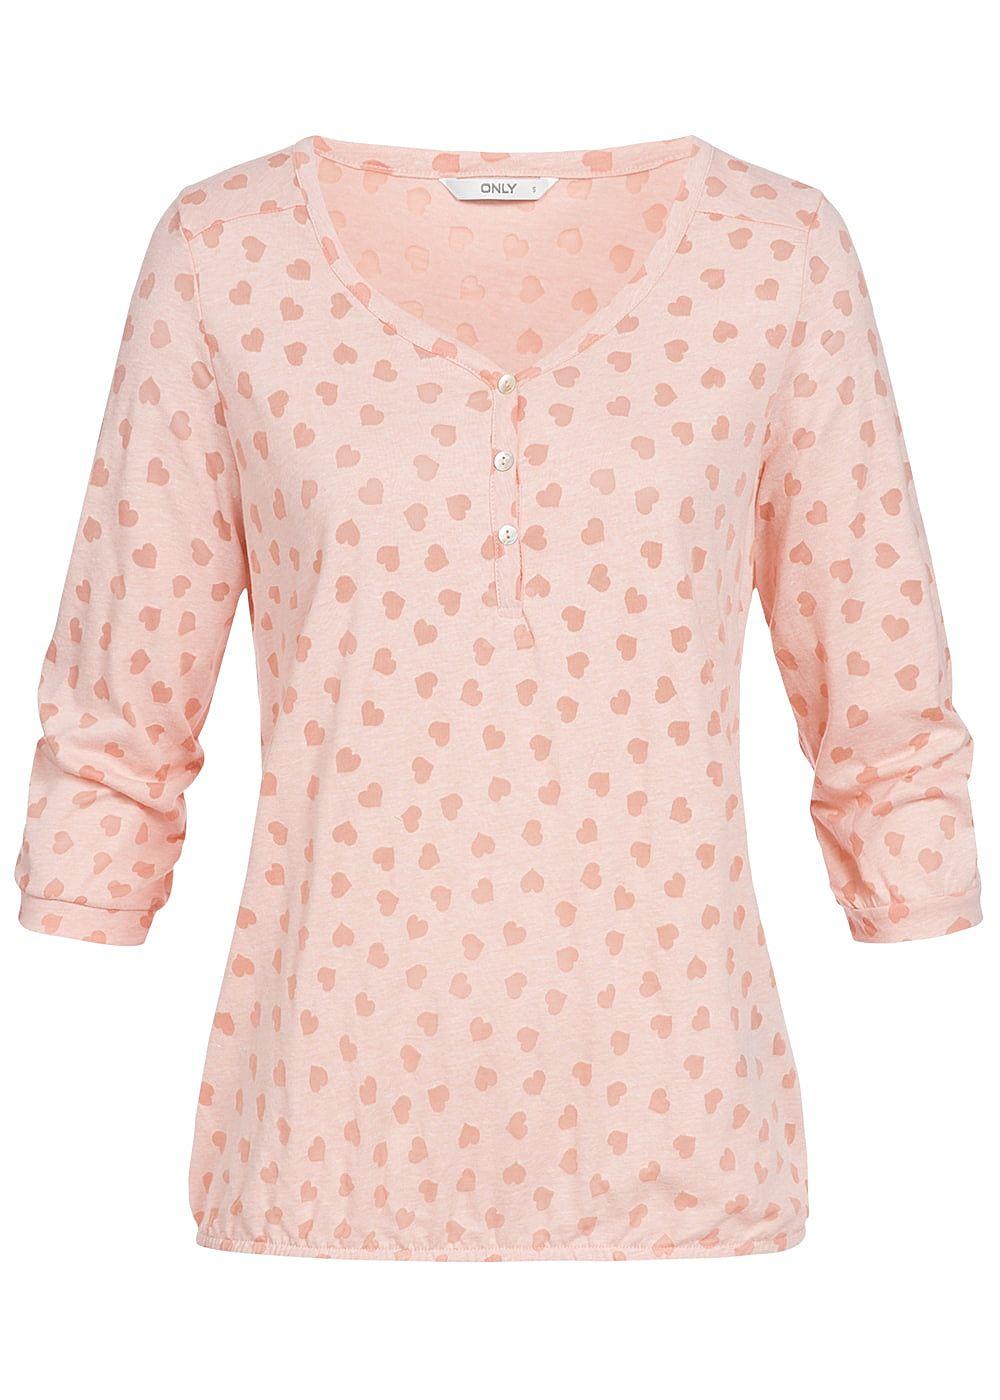 ONLY Damen 3/4 Arm Shirt Herz Muster V-Ausschnitt Gummibund smoke rosa